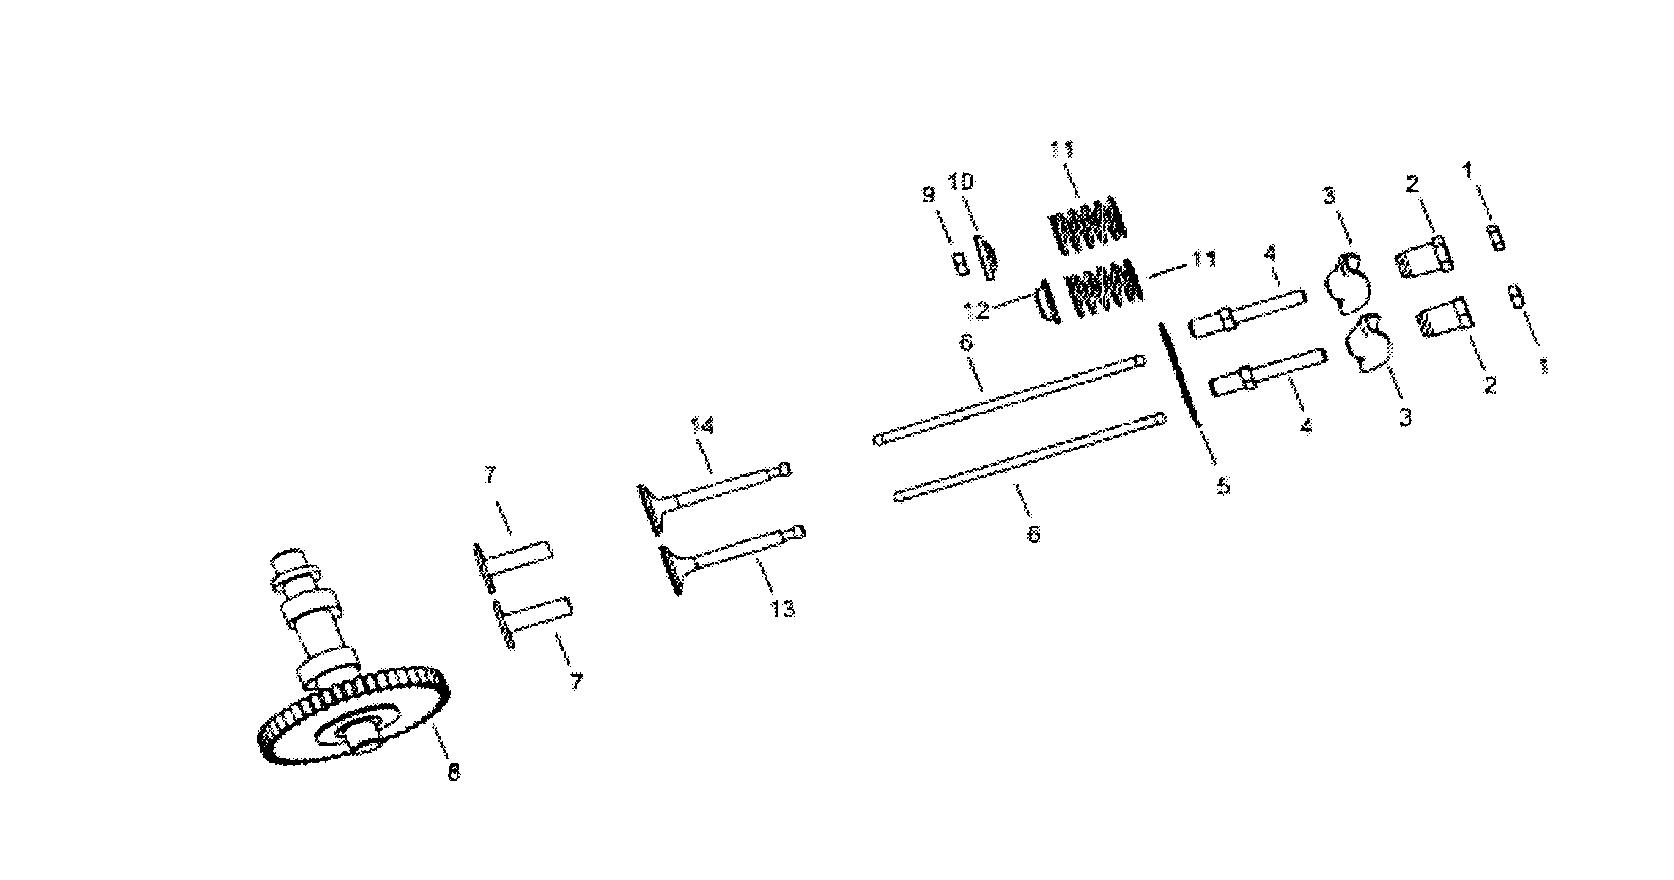 50034051 00006?resize\\\\\\\\\\\\\\\=665%2C349\\\\\\\\\\\\\\\&ssl\\\\\\\\\\\\\\\=1 onan engine wiring diagram ignition module john deere within 20 hp gravely promaster 300 wiring diagram at fashall.co